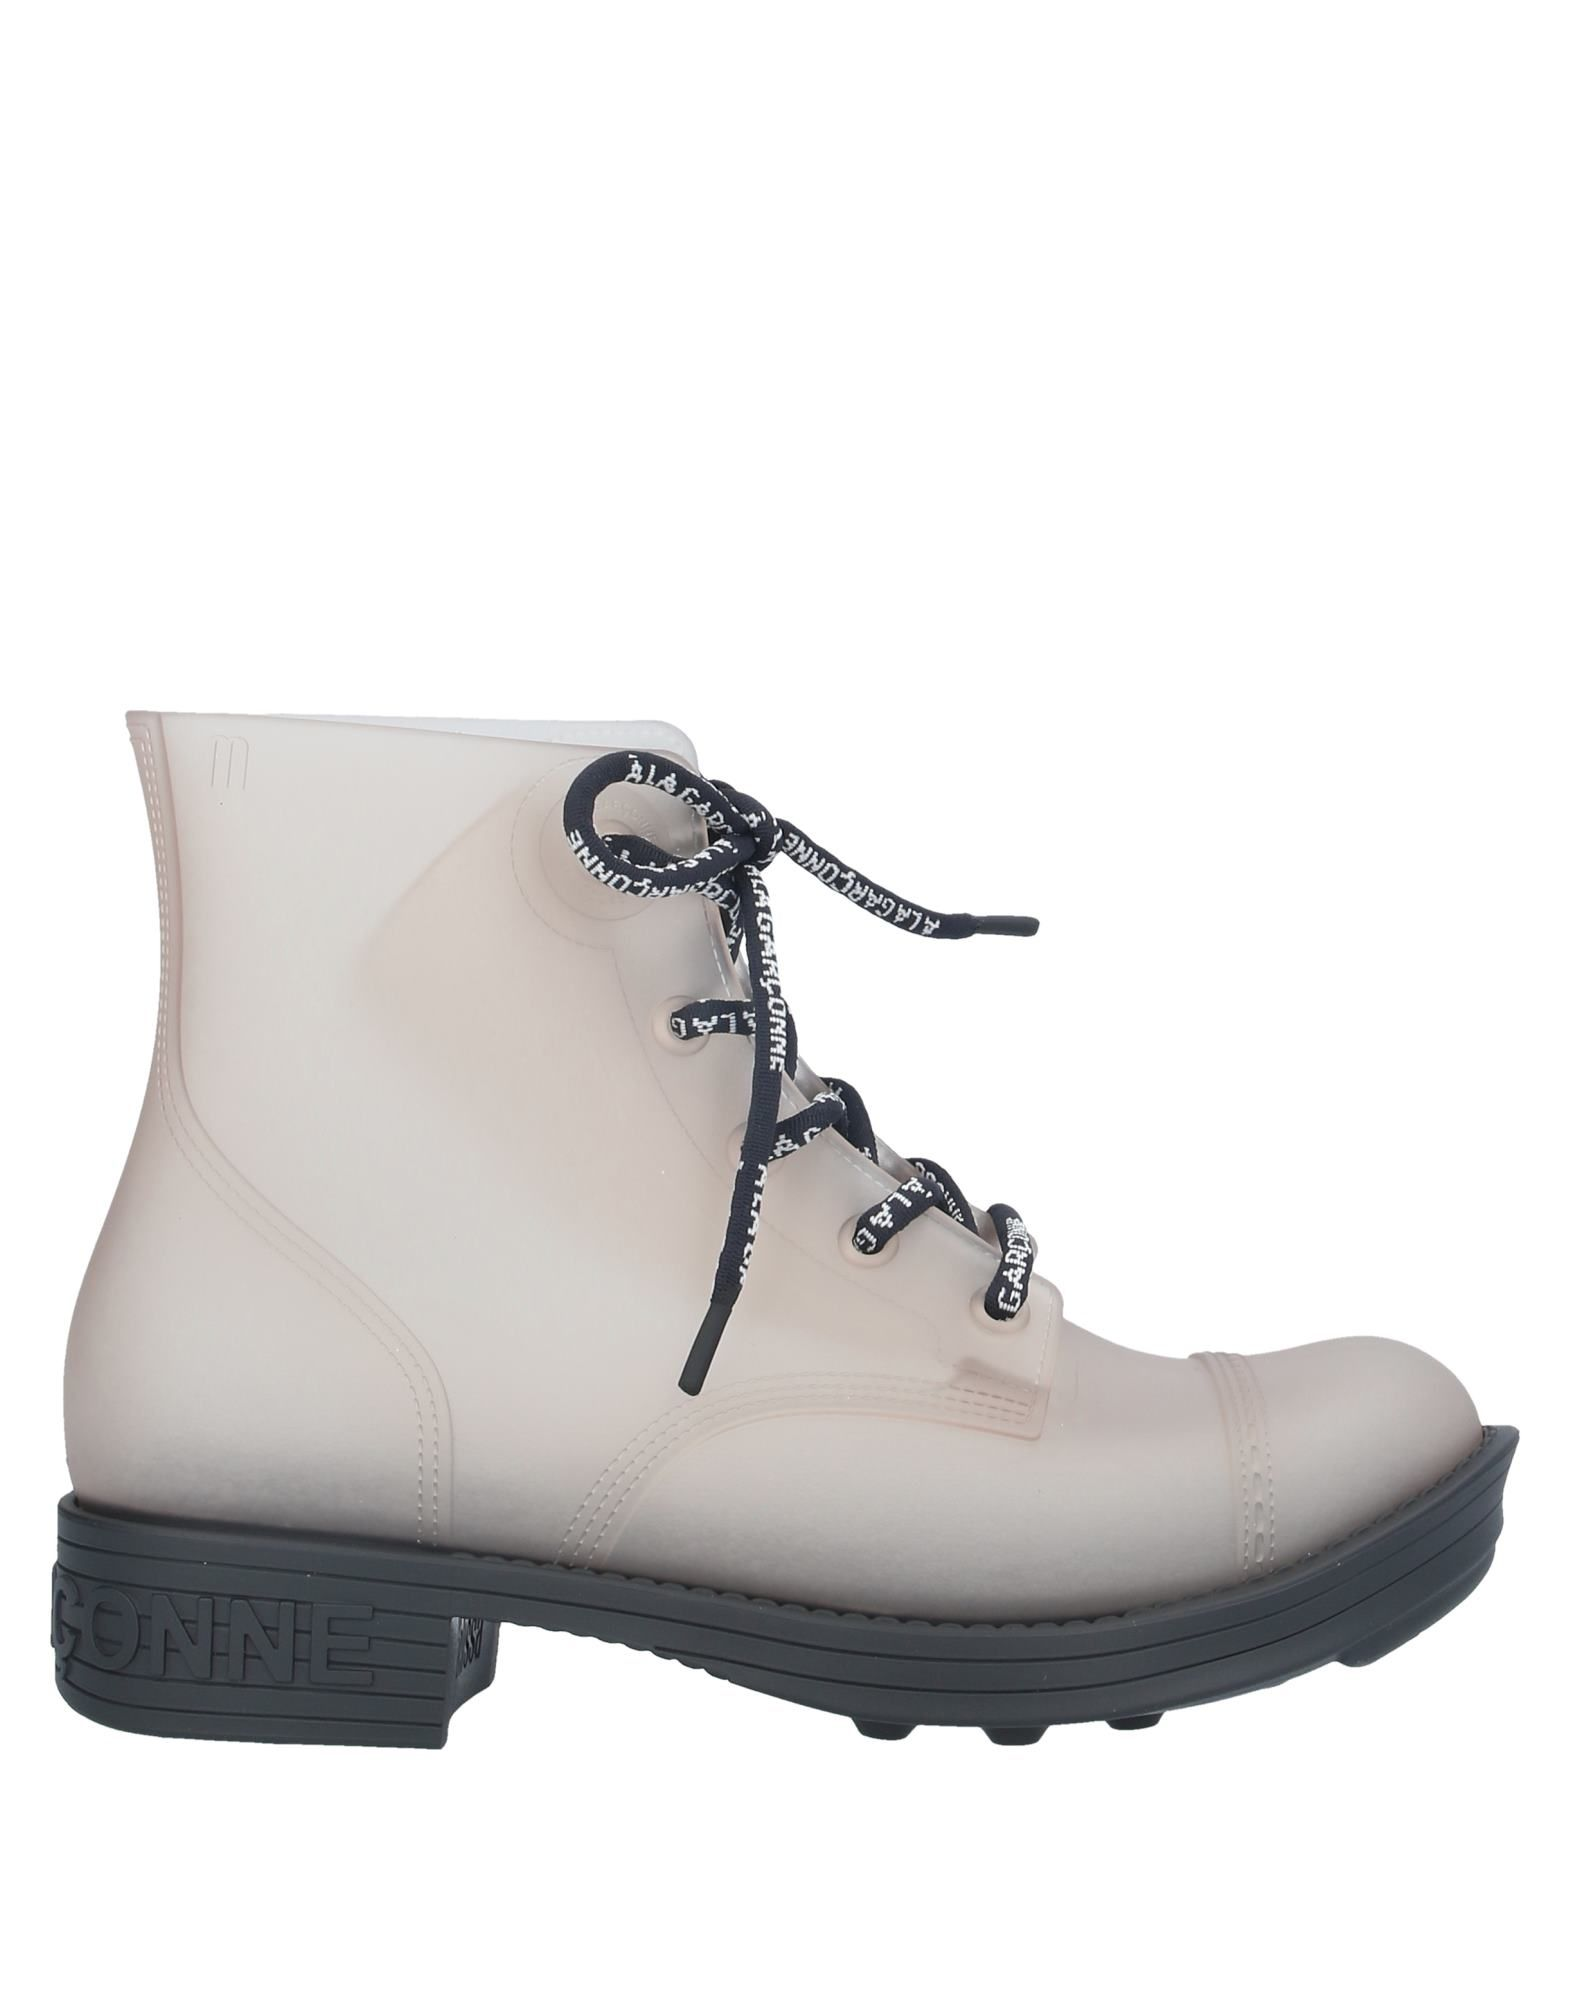 MELISSA / À LA GARÇONNE Полусапоги и высокие ботинки